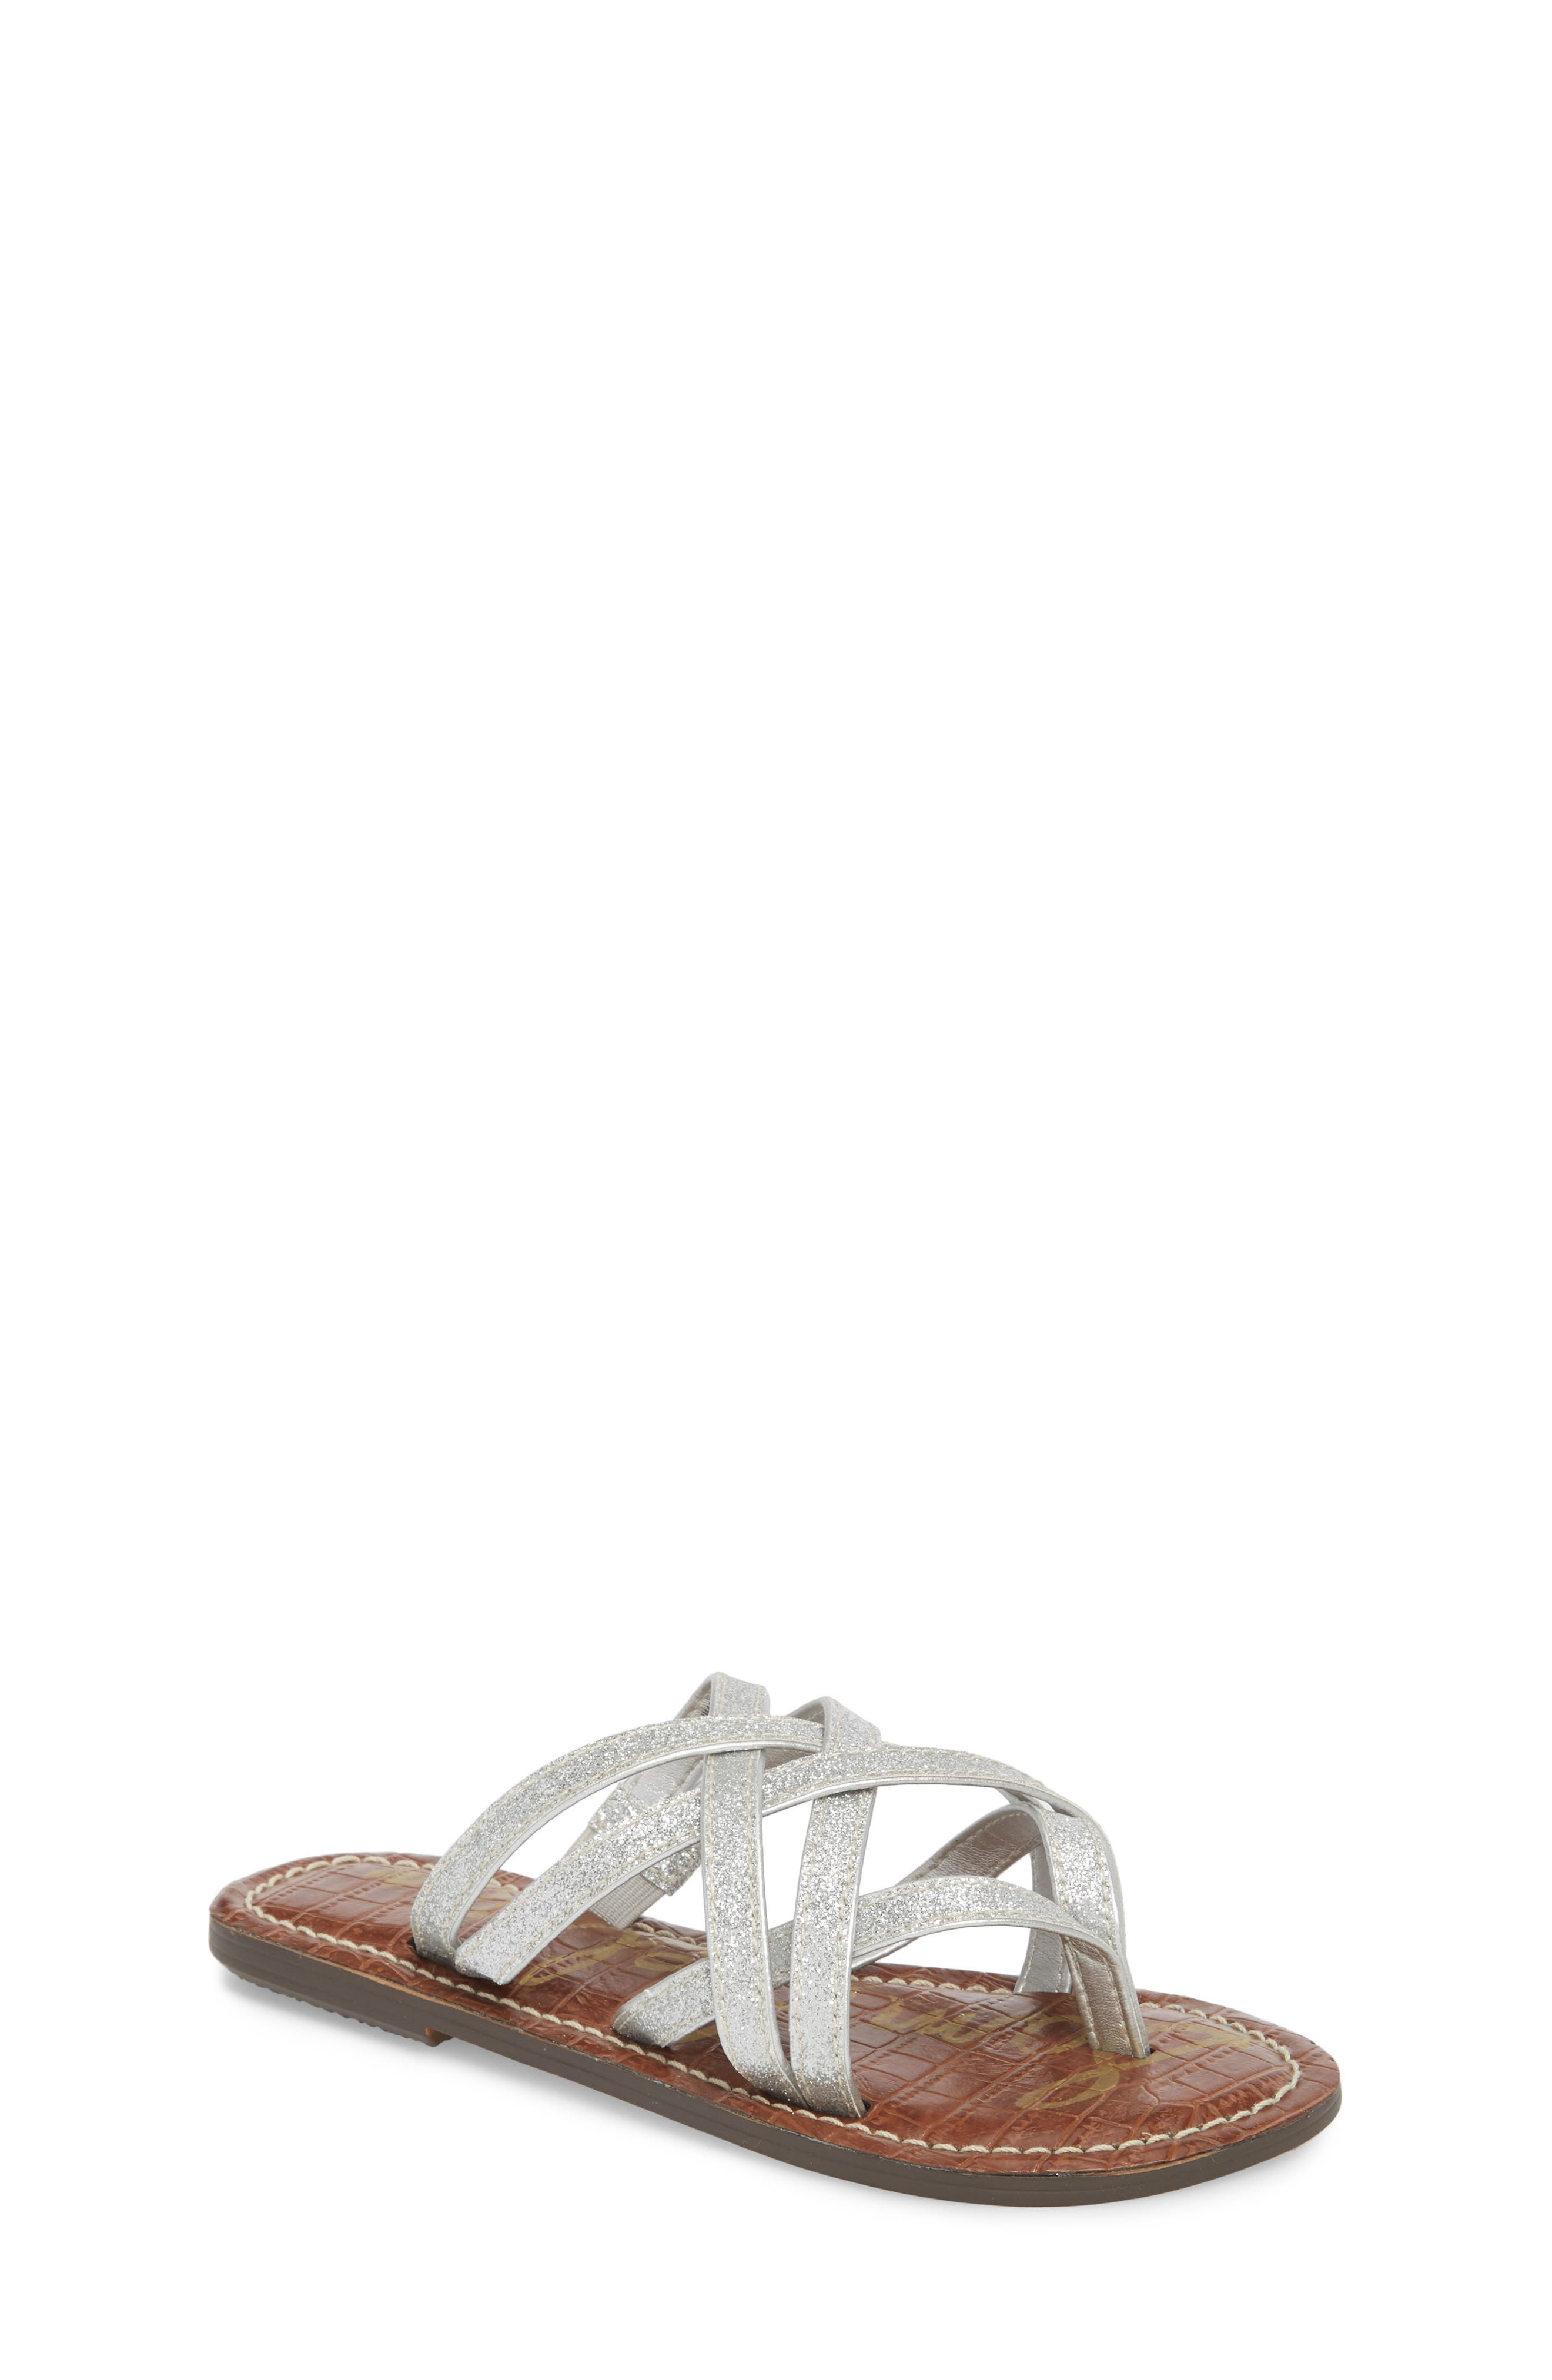 Georgette Glitter Flat Sandal,                             Main thumbnail 1, color,                             040